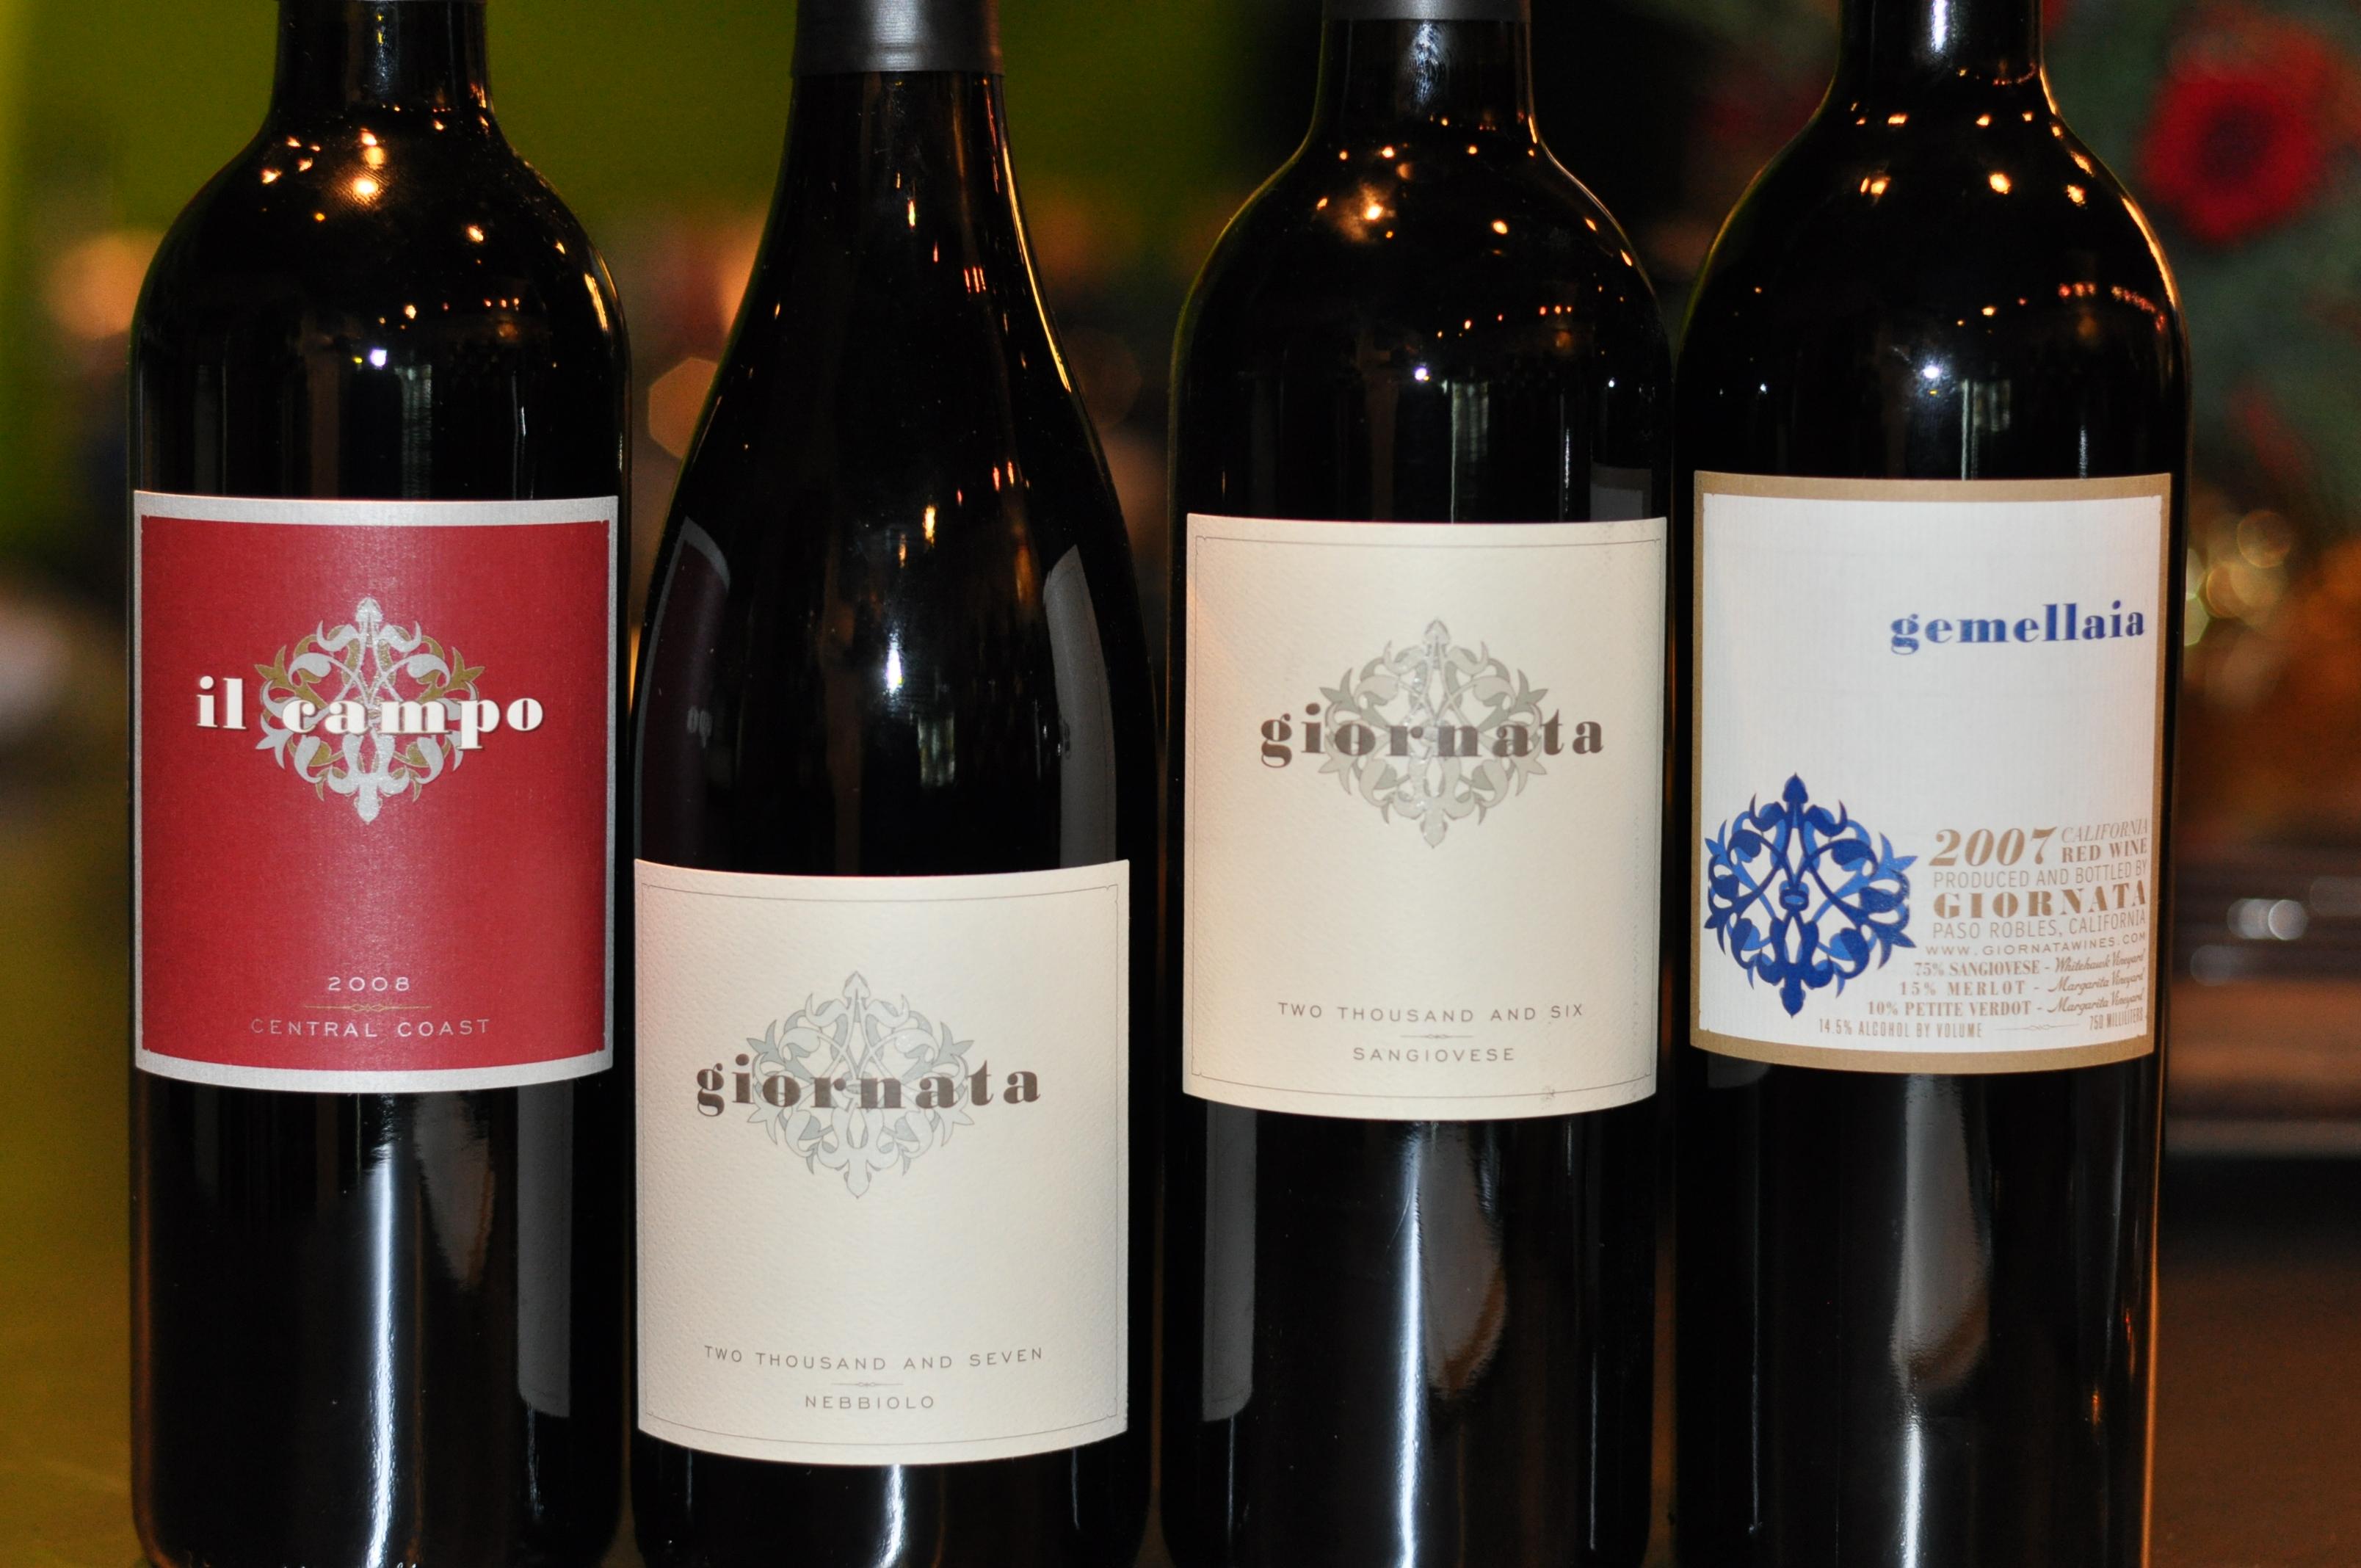 Giornata   SF Wine Blog